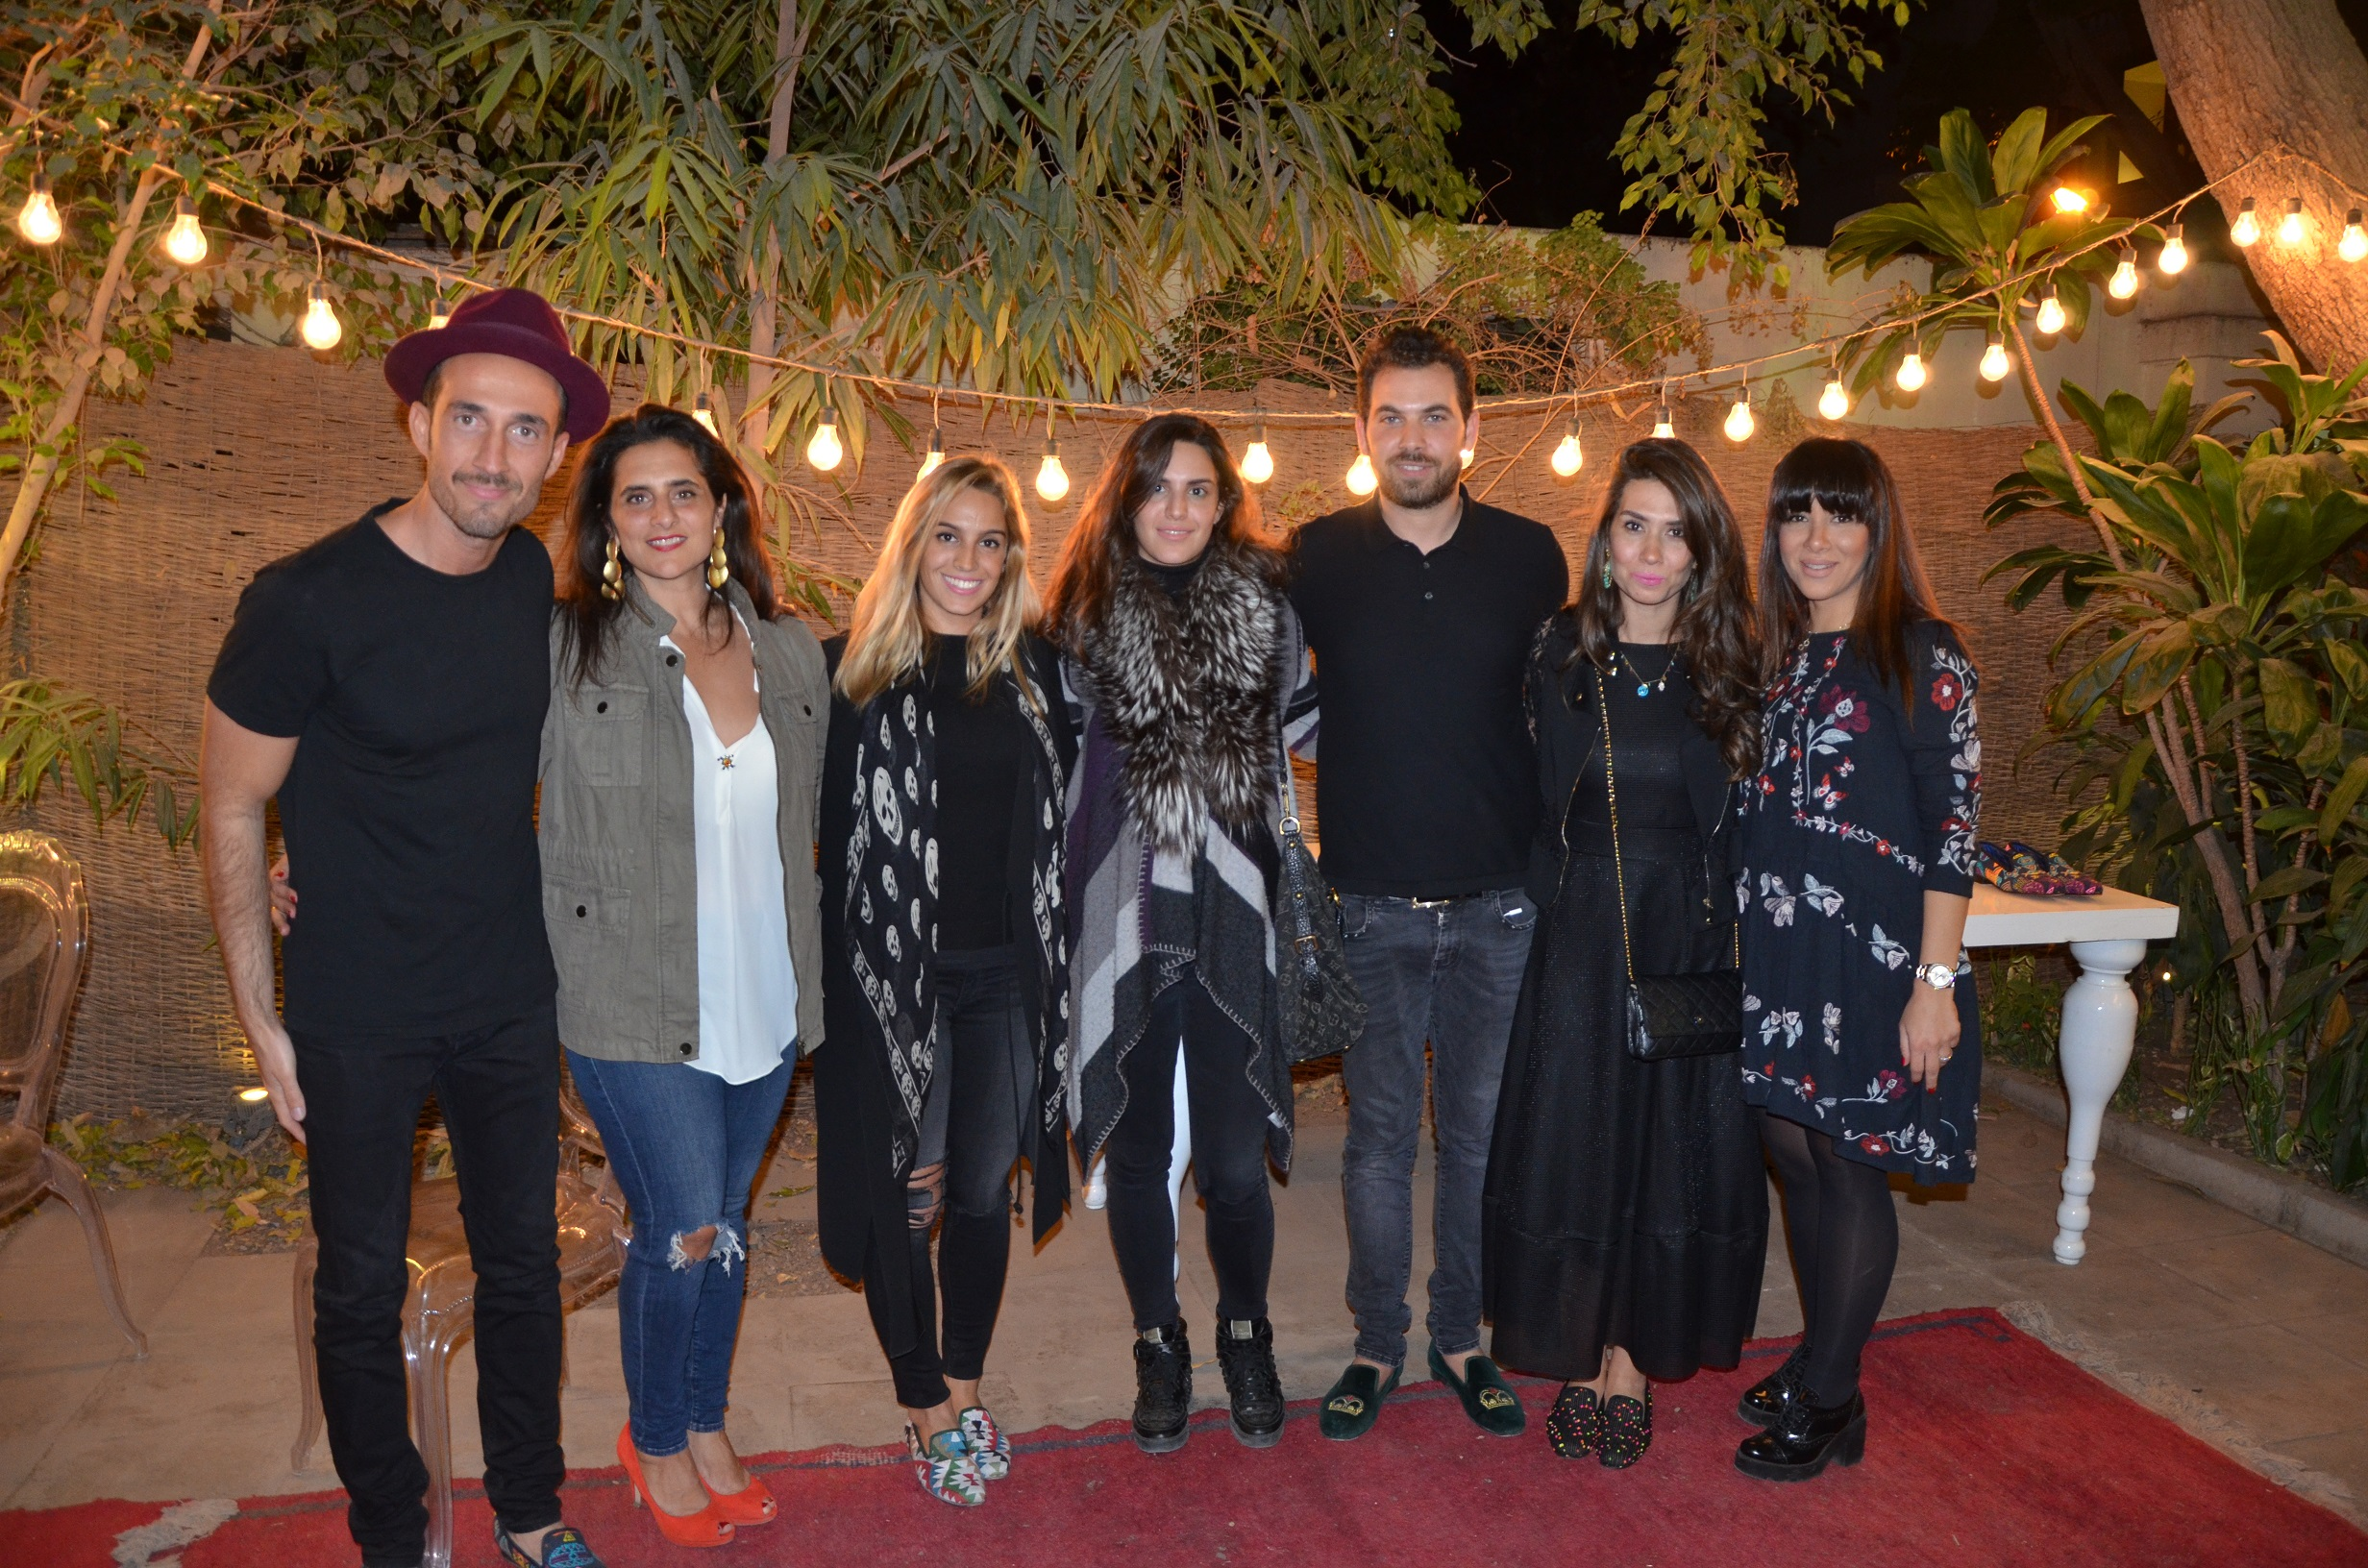 Khaled Makki, Nada Azzam, Sarah Mansour, Ayda Mansour, Ahmed Makki, Hala Makki & Manal Abbas